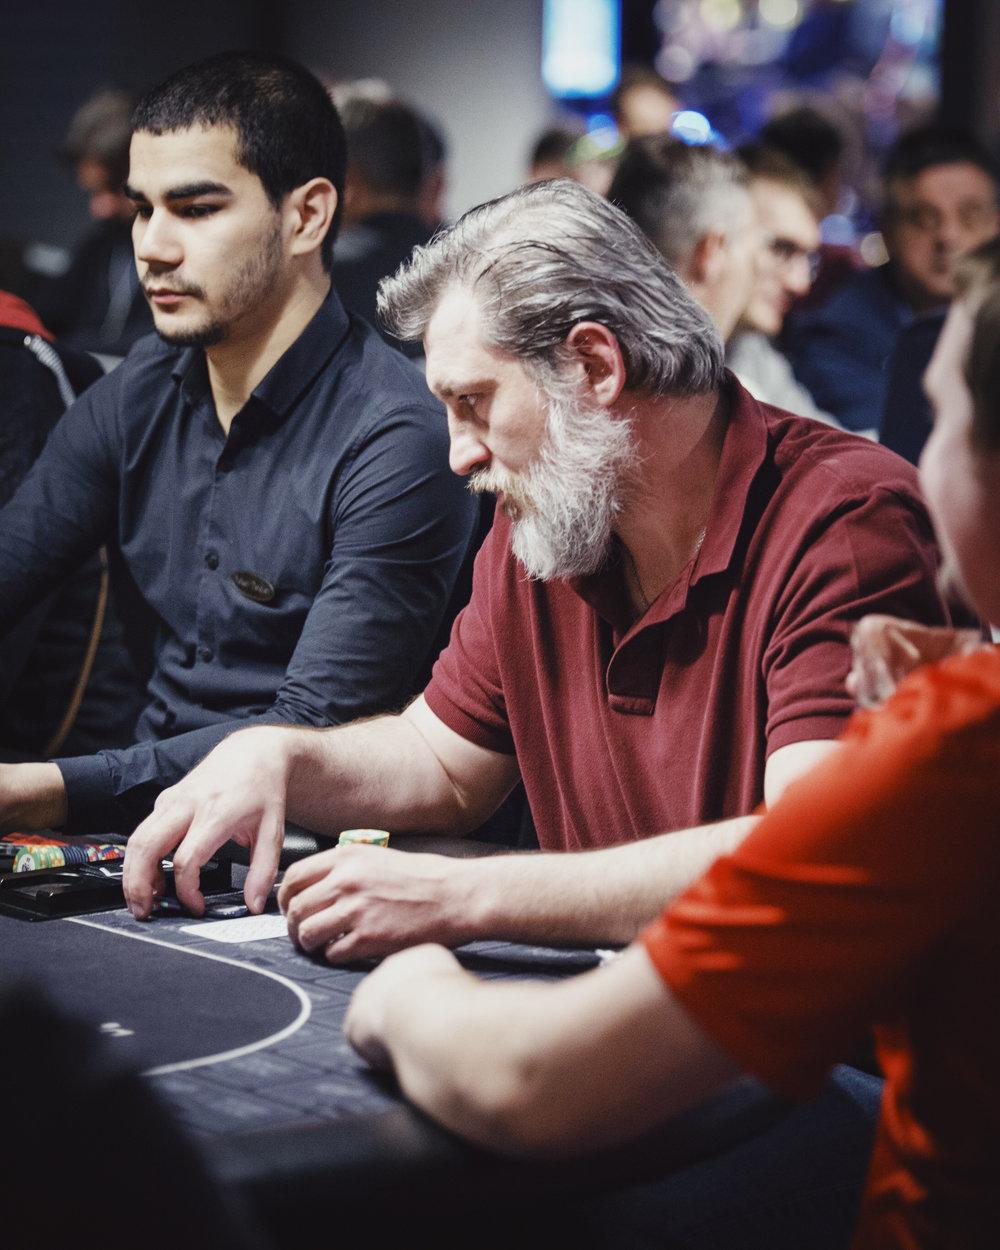 polina-shubkina-poker-038.JPG